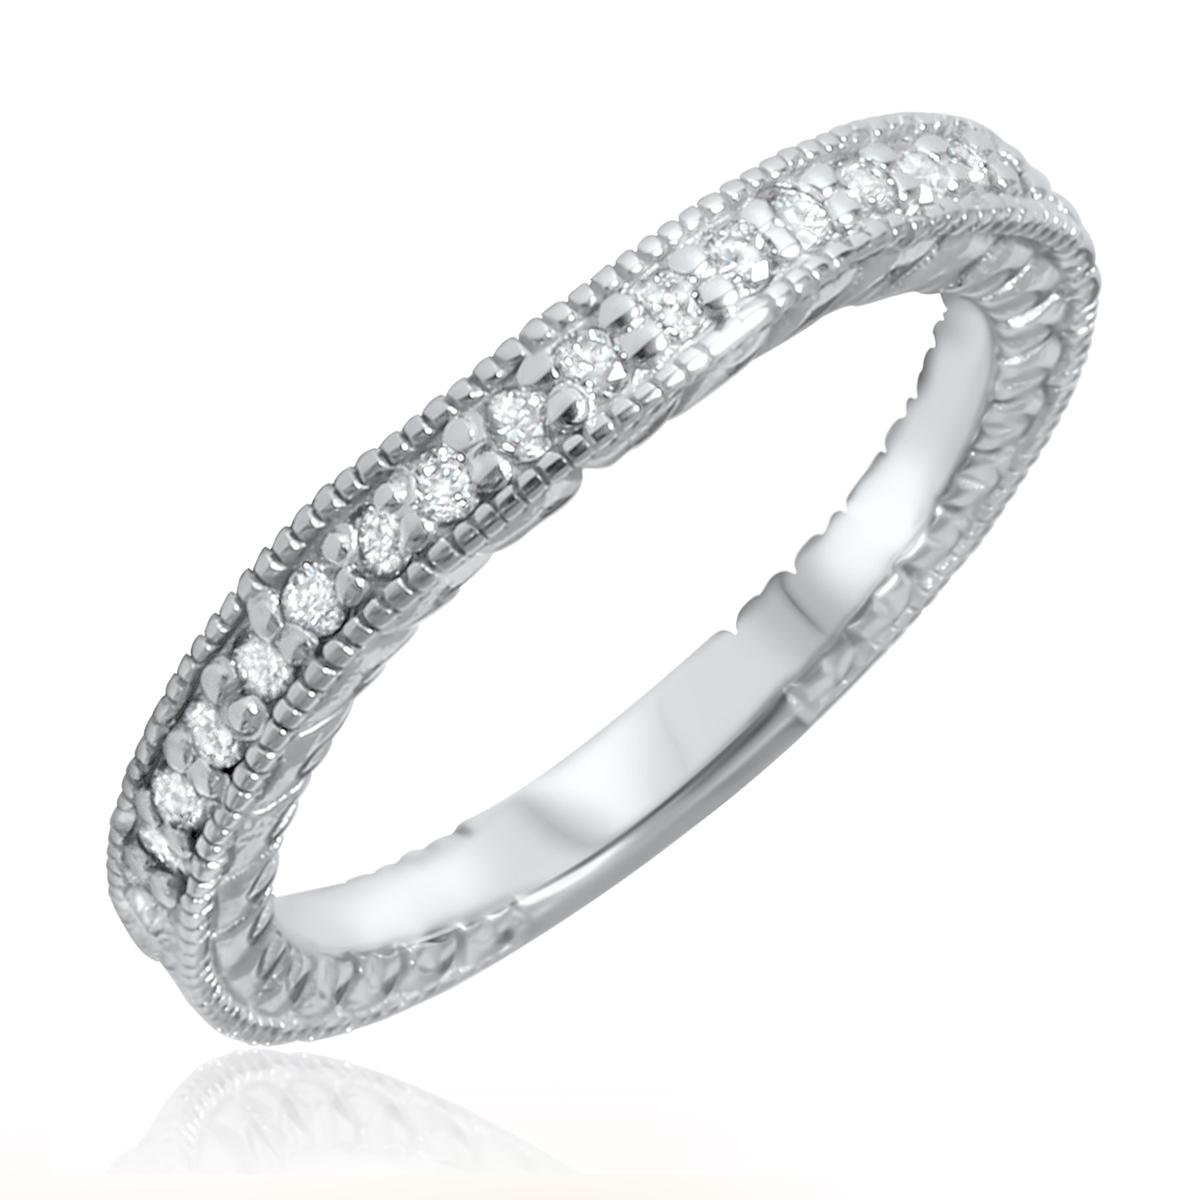 1/6 Carat T.W. Round Cut Diamond Ladies Wedding Band 14K White Gold- Size 8